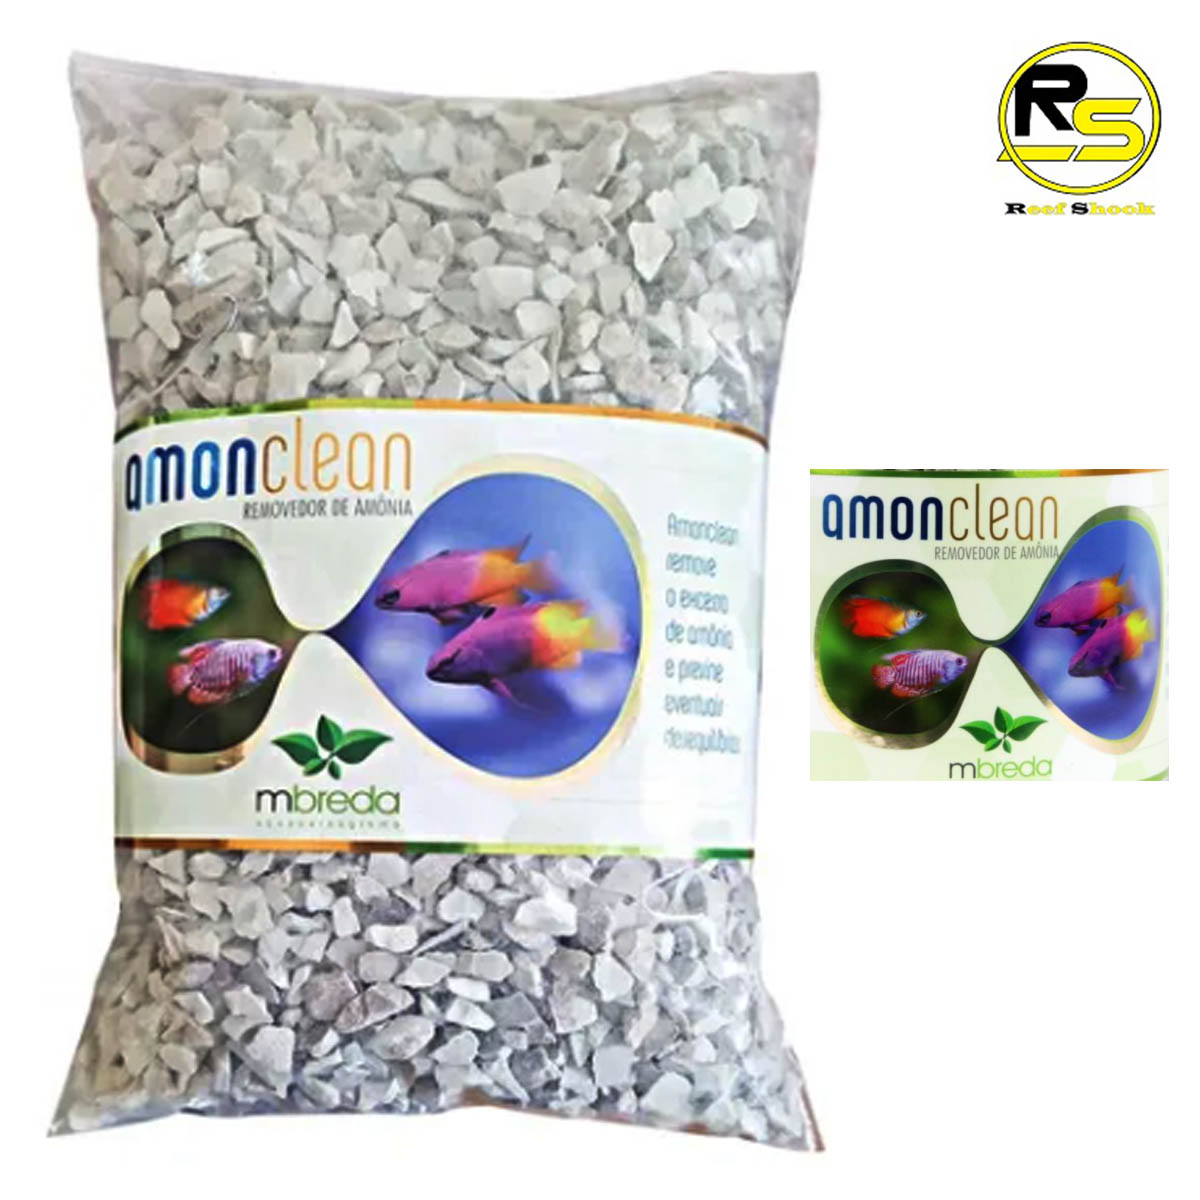 Removedor de Amonia Mbreda Amonclean 1kg Refil